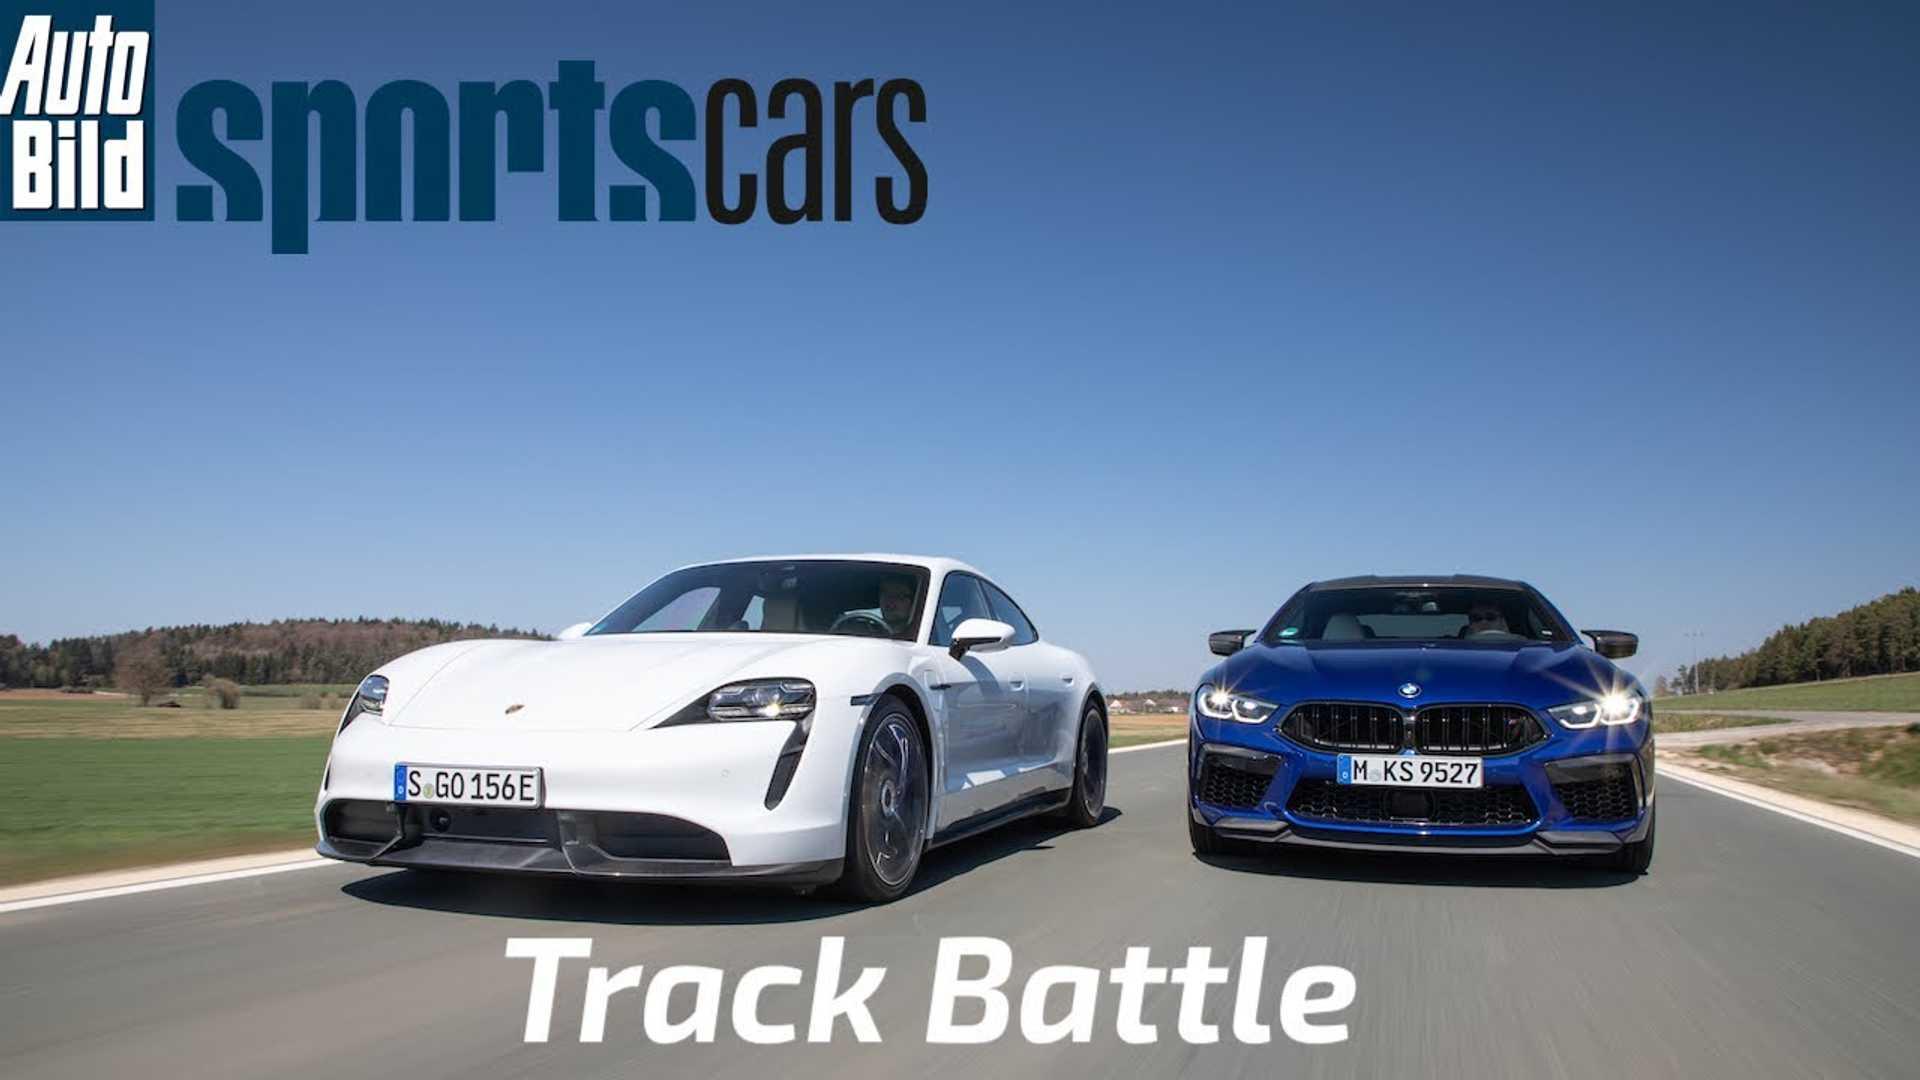 YouTube-канал AutoBildSportsCars опубликовал видео заезда «заряженных» седанов – электрического Porsche Taycan Turbo S и бензинового BMW M8 Gran Coupe Competition. Пилот преодолел за рулём спорткаров трек Лаузицринг длиной 4,5 километра.